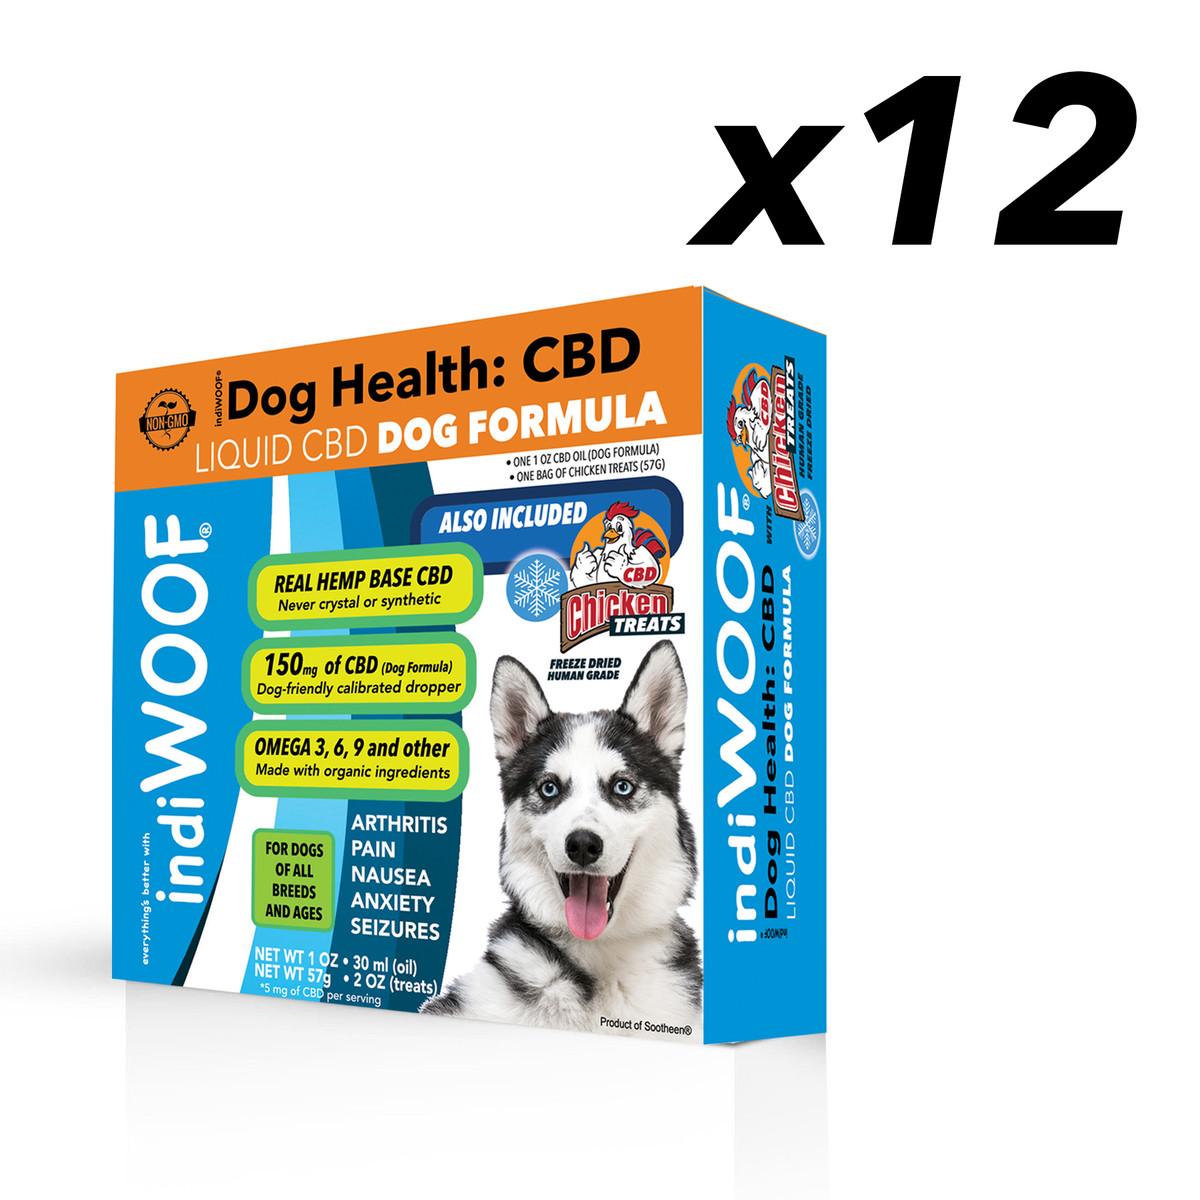 indiWOOF® CBD Liquid 30 ml / 1 fl oz bottle + indiPETUSA CBD Chicken Treats for Dogs  - BULK